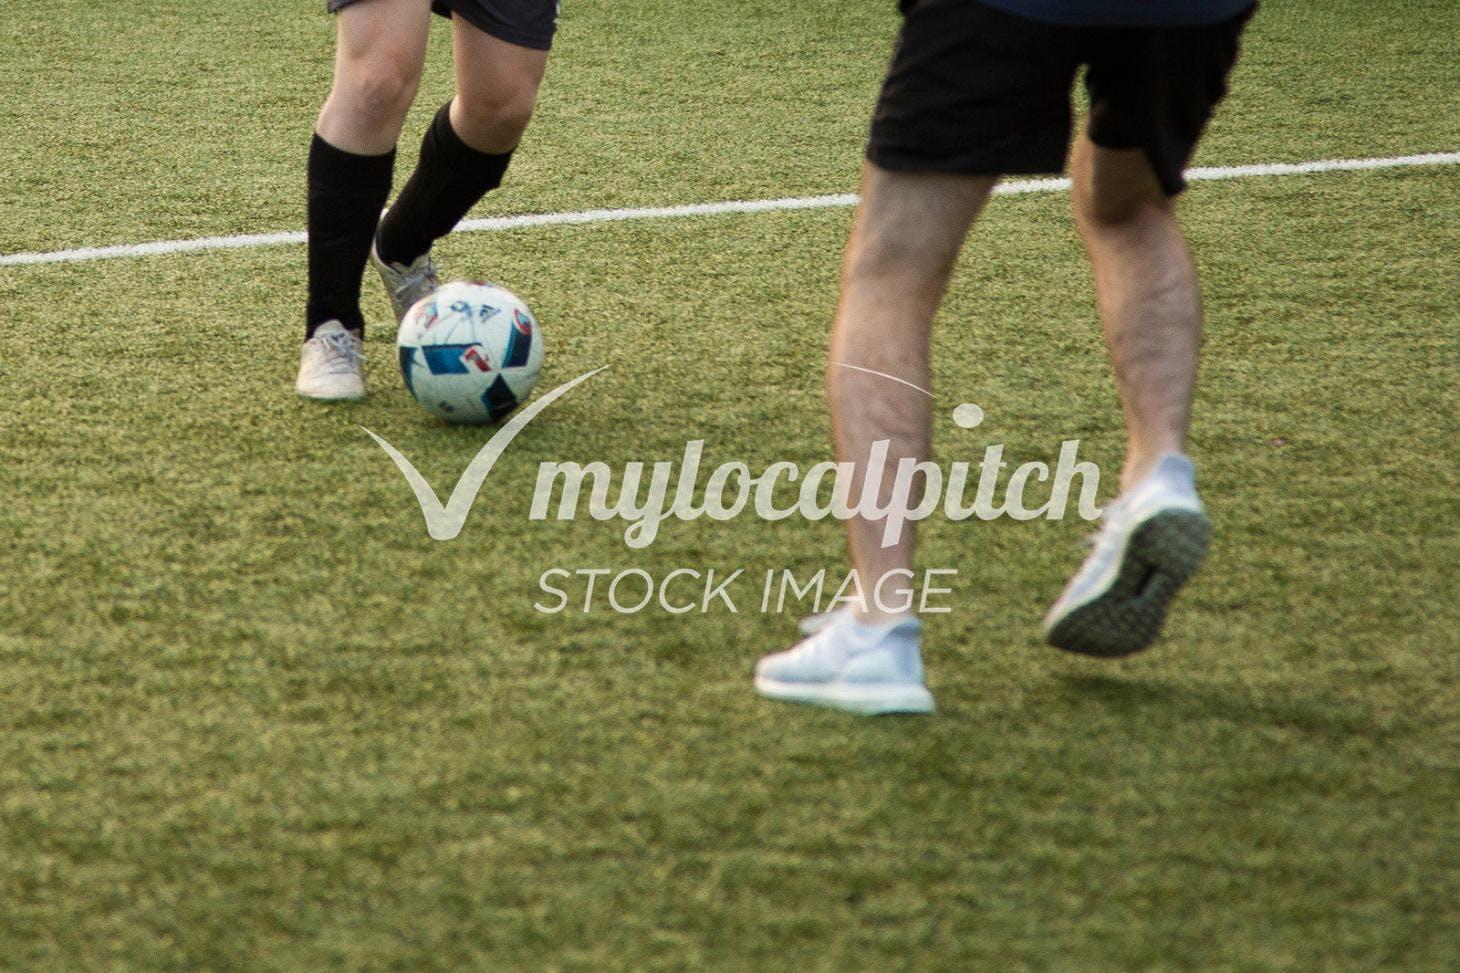 Crumlin Utd 11 a side | Grass football pitch